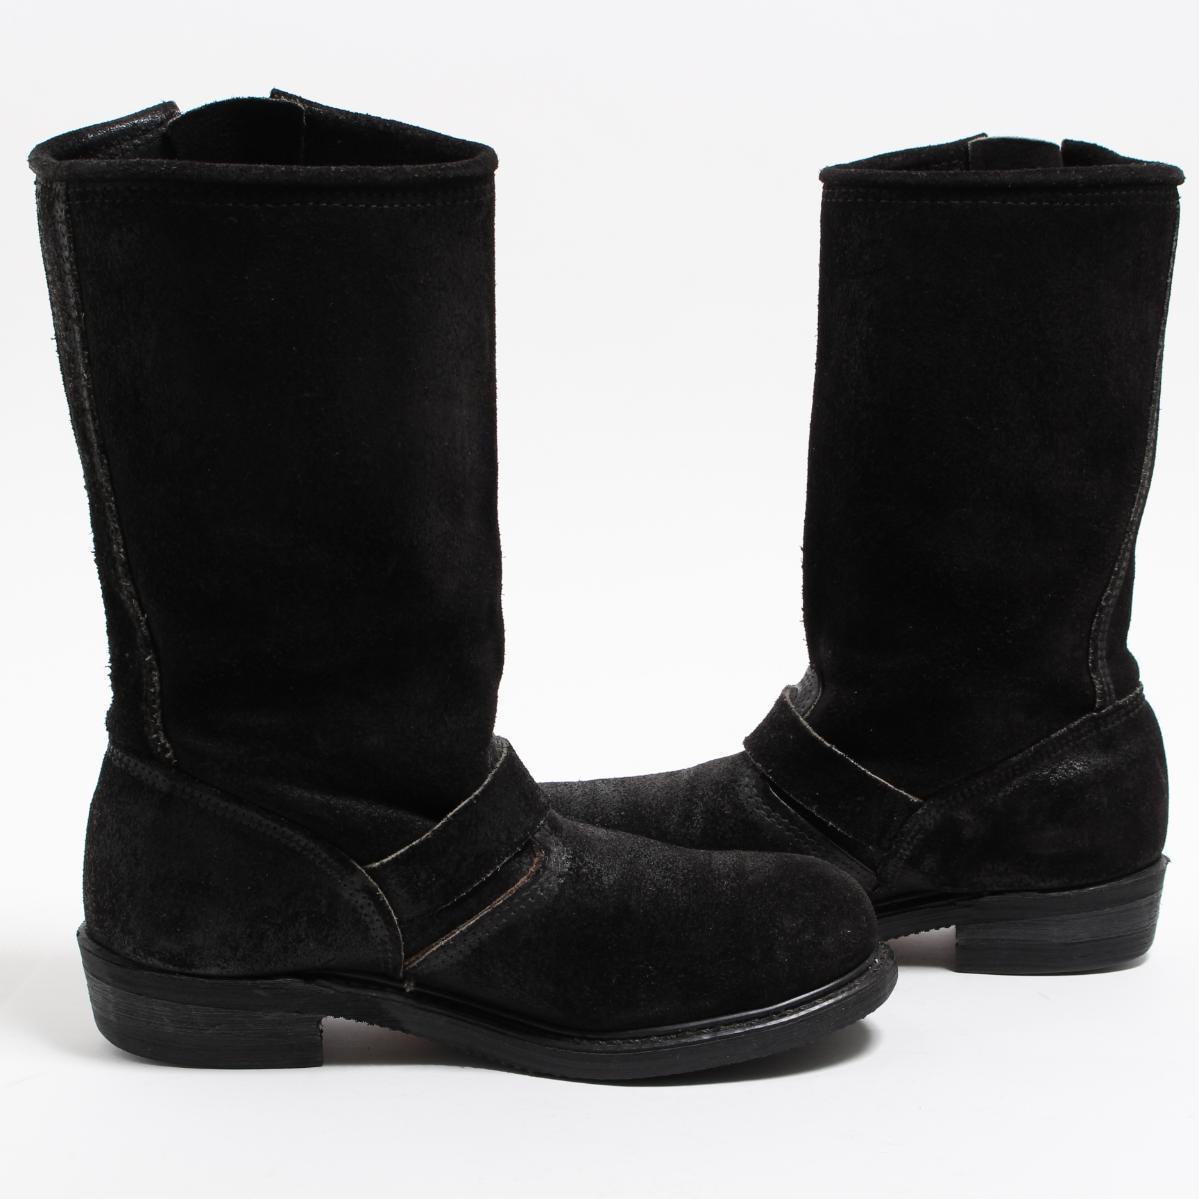 030d67d4af8 Calorina Carolina steel toe engineer boots Lady's 23.0cm /boo6934